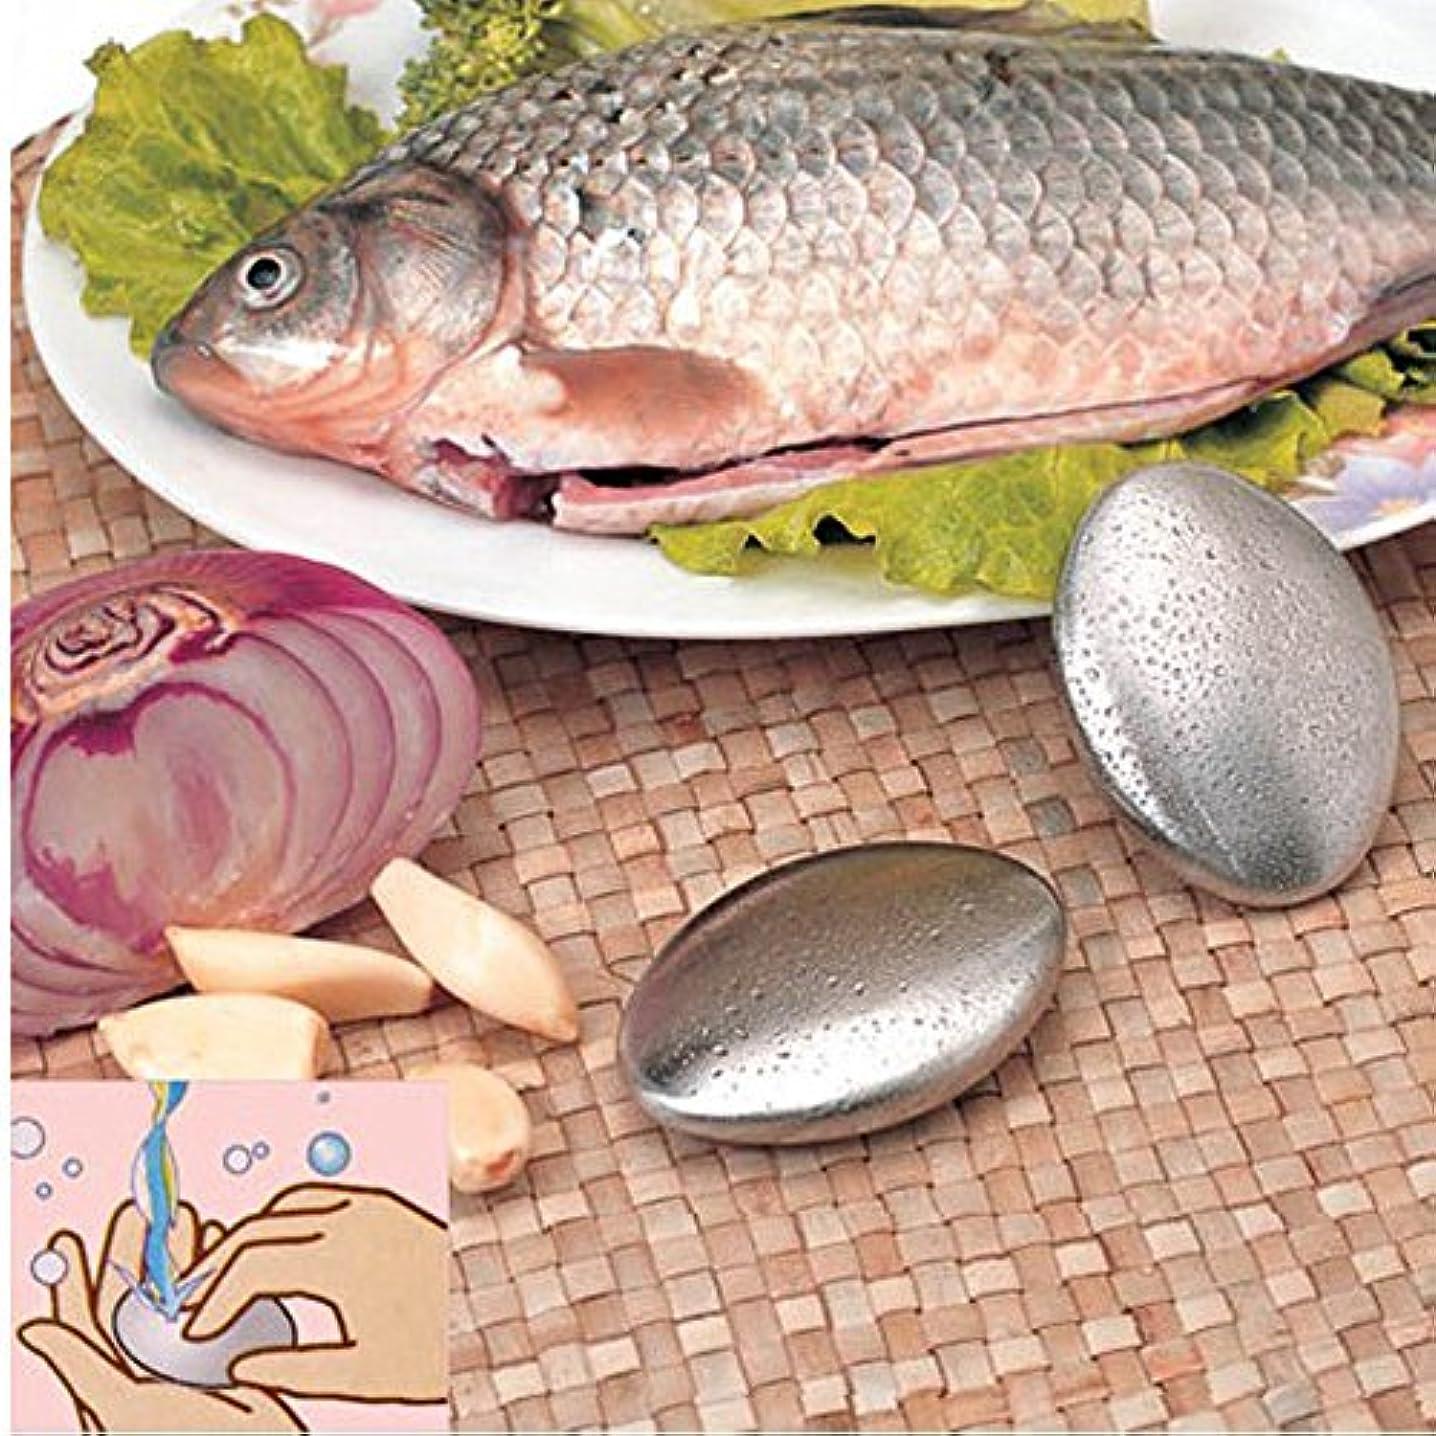 zlianhui のステンレス鋼の石鹸、臭気の除去剤のステンレス鋼の石鹸の台所棒は石鹸箱が付いている臭気の除去剤を除去します